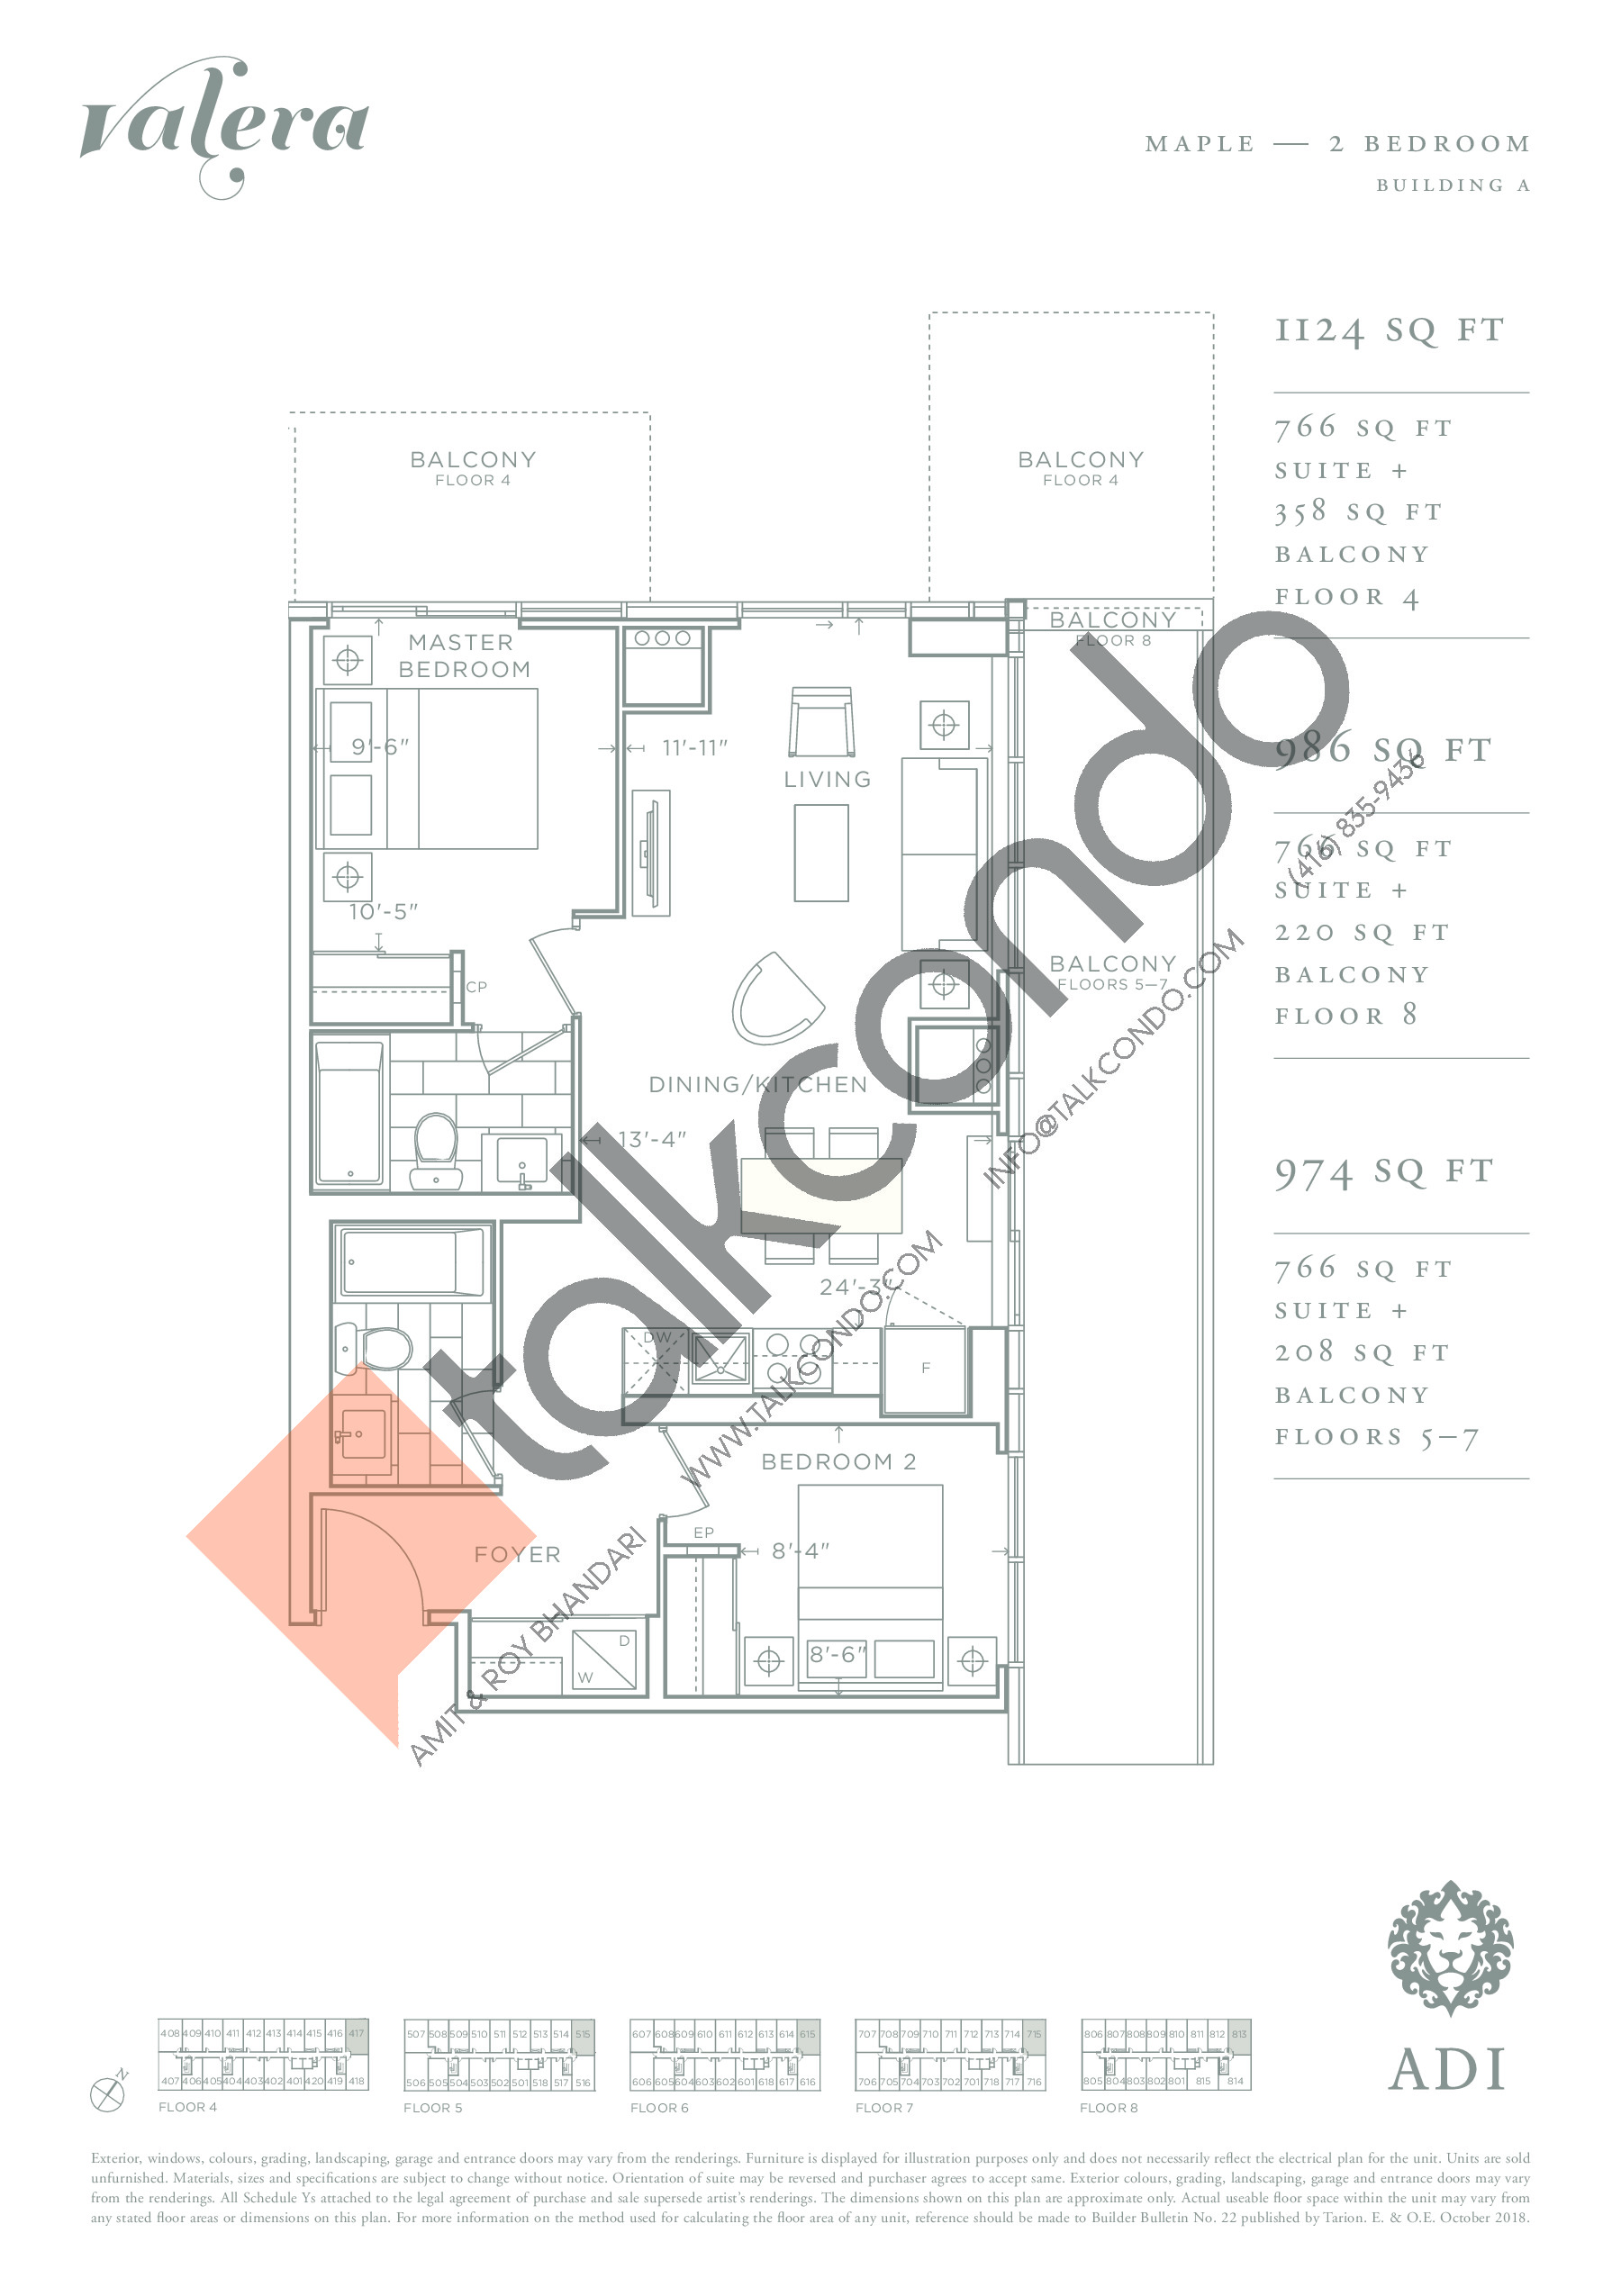 Maple Floor Plan at Valera Condos - 766 sq.ft